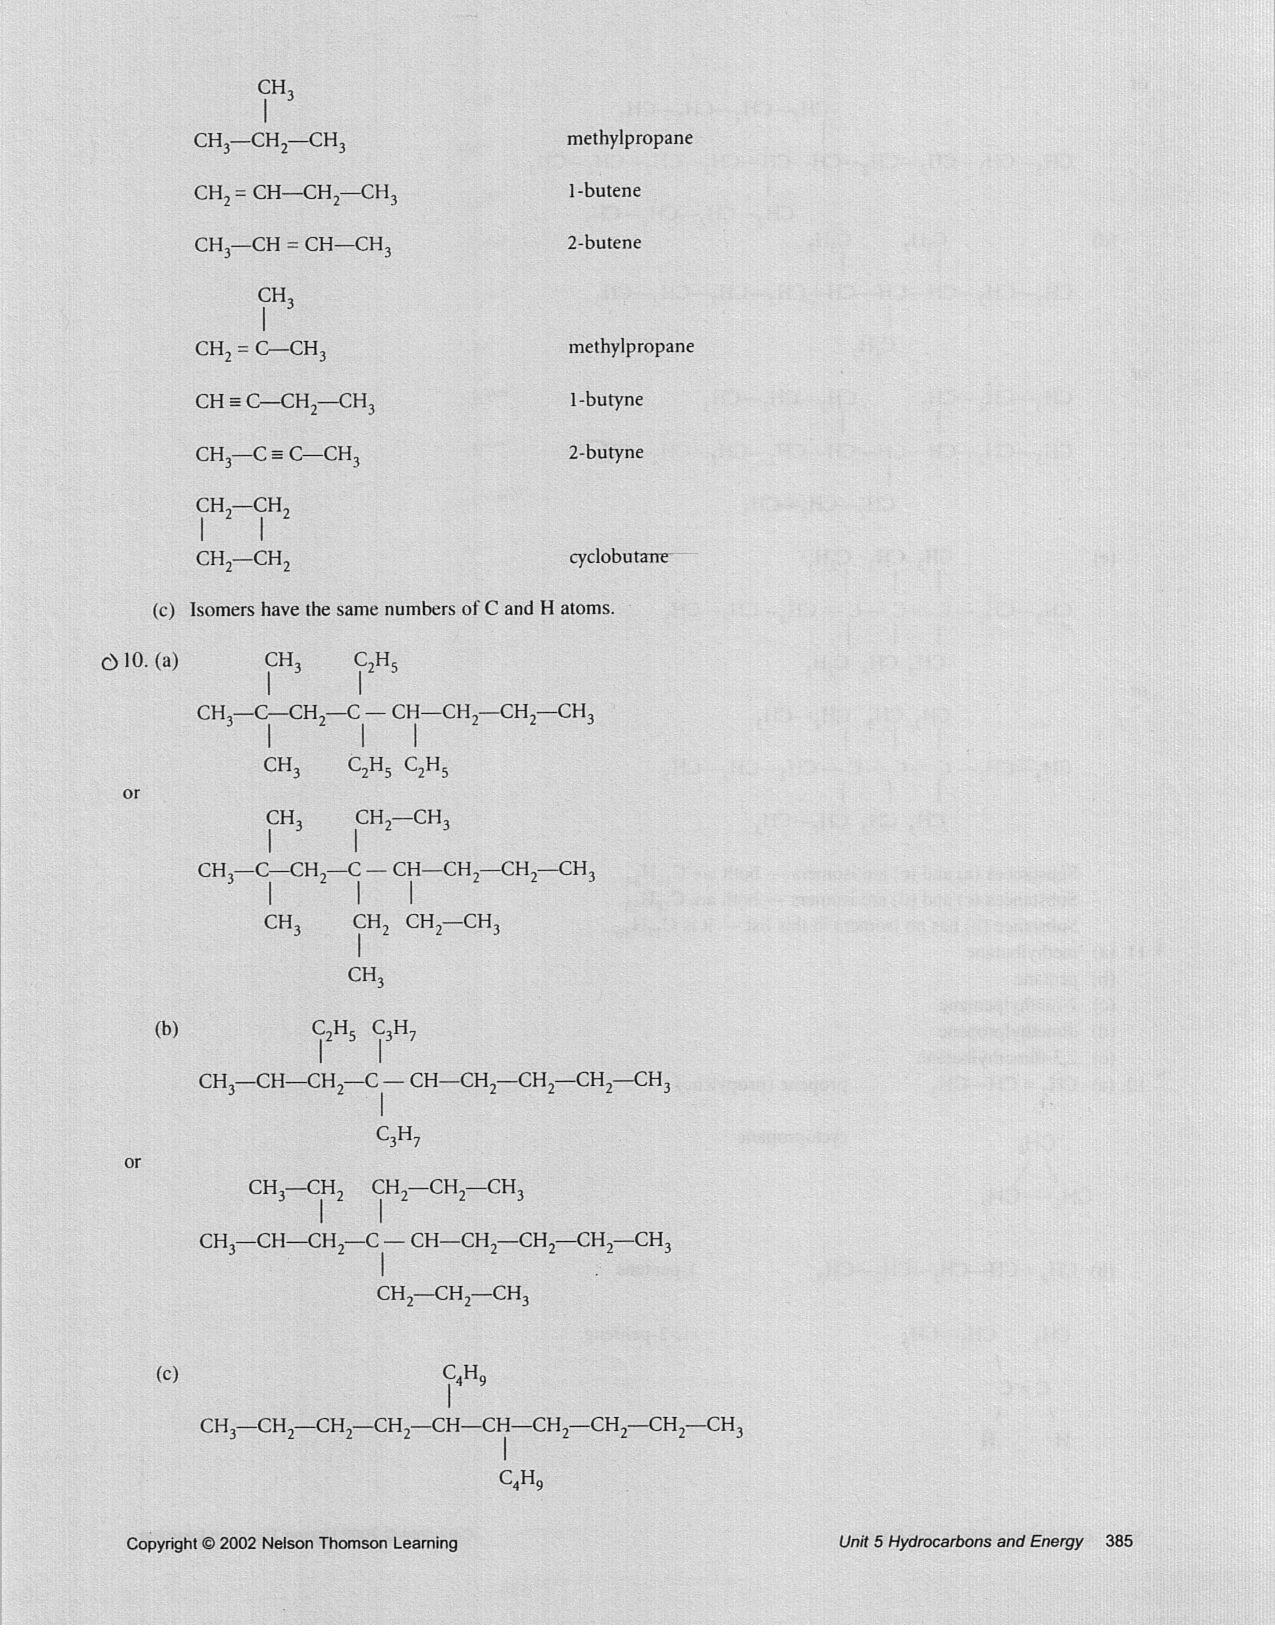 Grade 10 Chemistry Answers